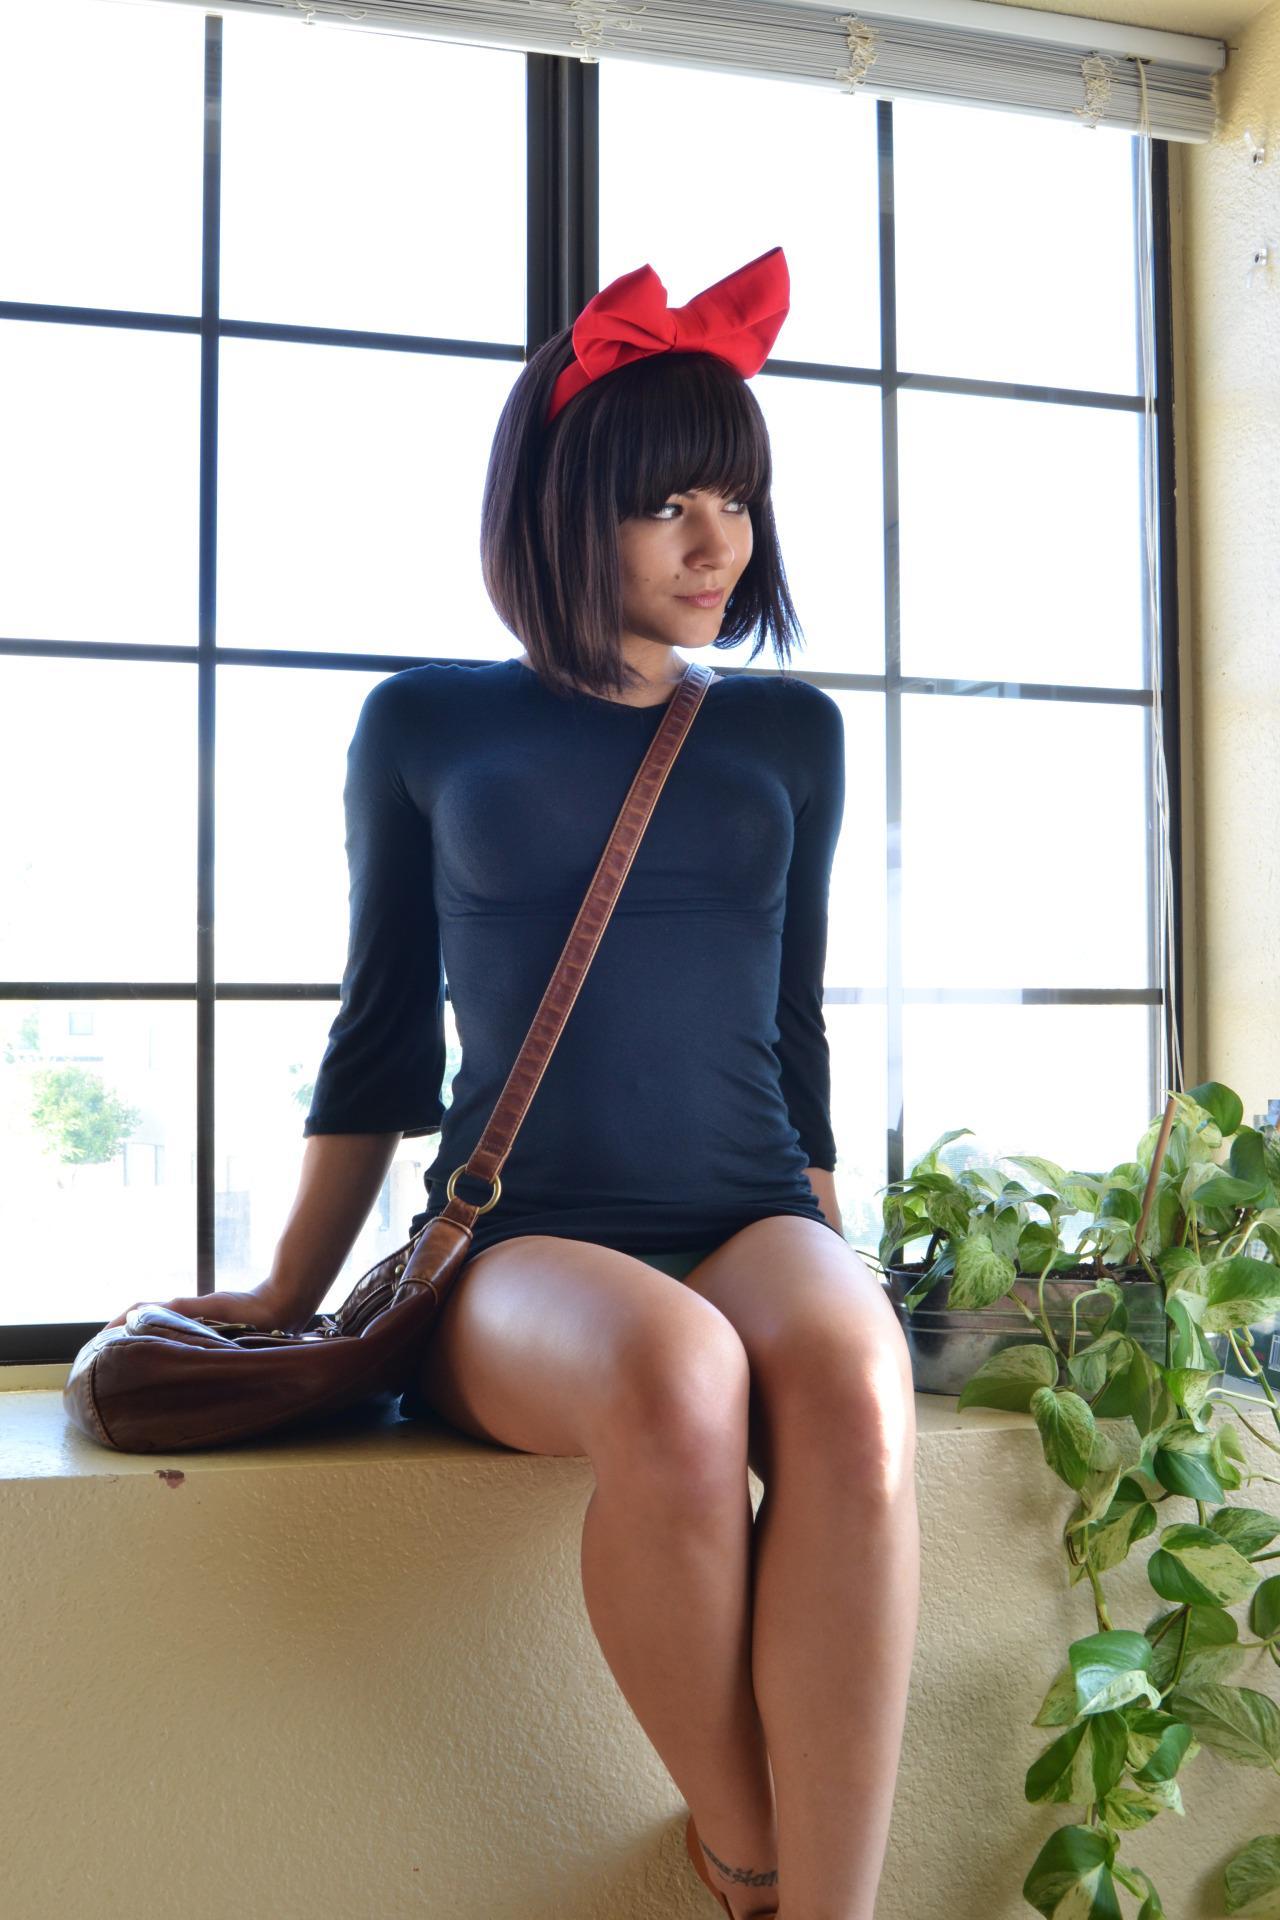 Kiki la petite sorcière Lanei BadHabit #cosplay http://t.co/S2y7nrzkt5